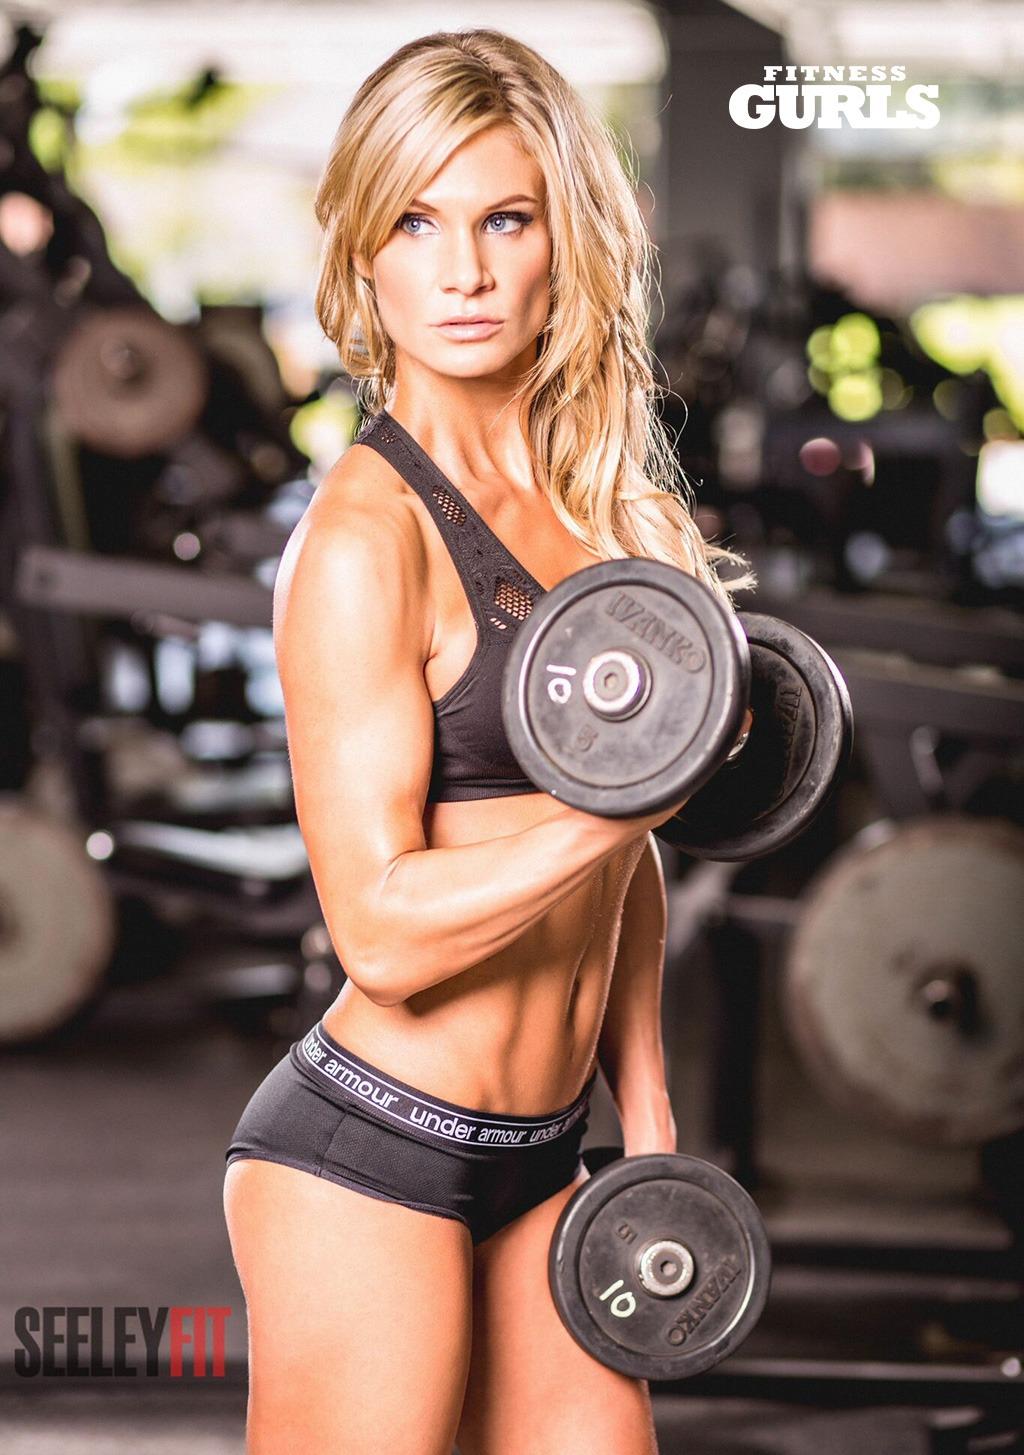 abi-christine-fitness-gurls-06